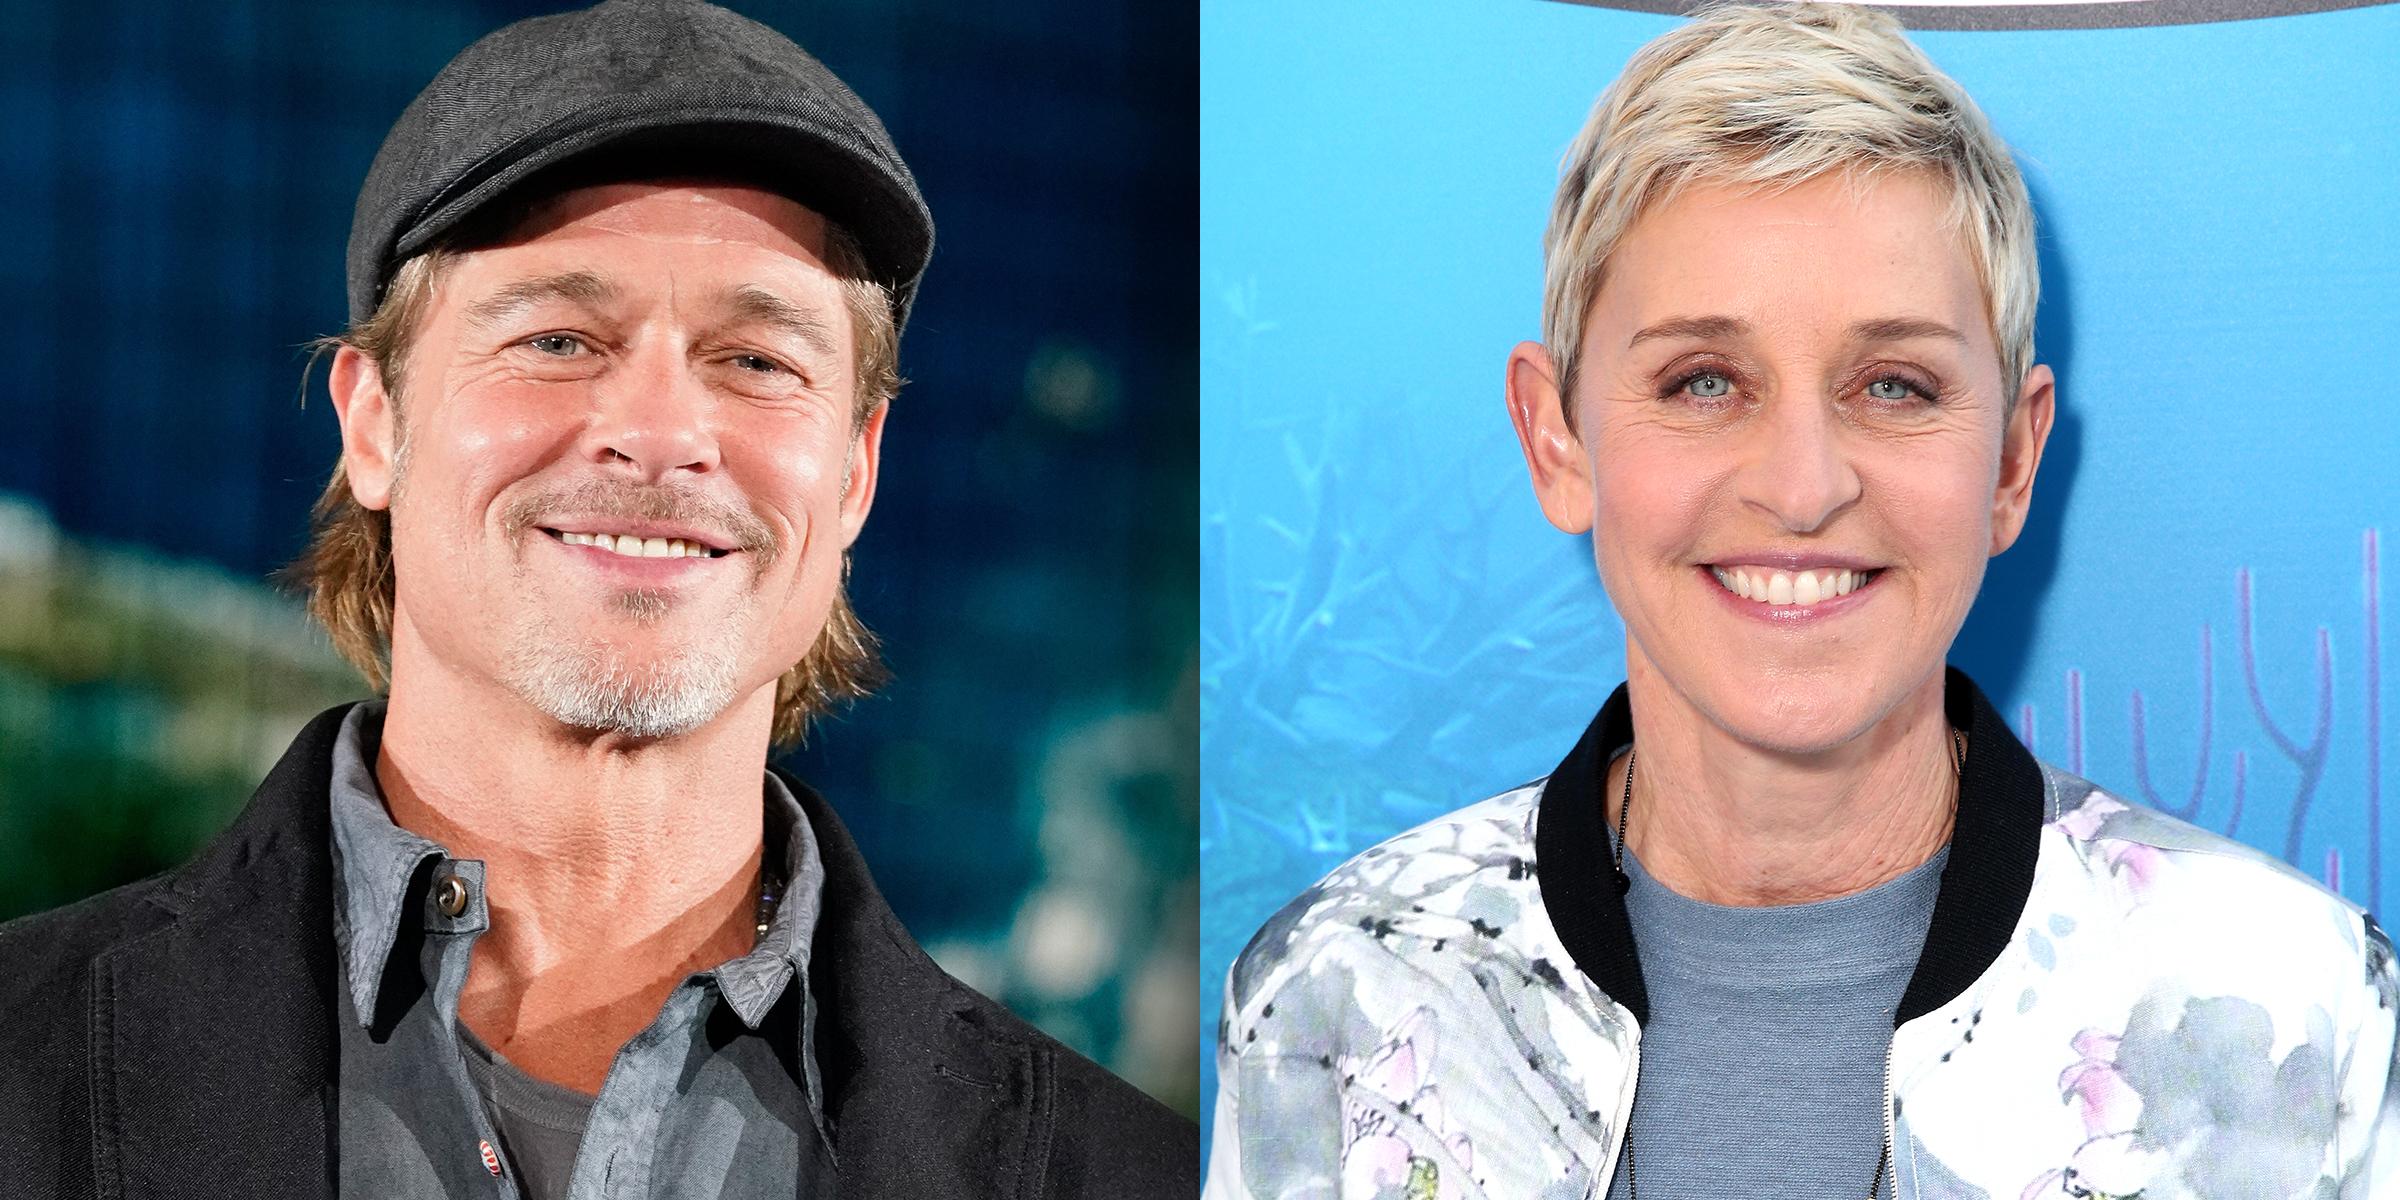 Brad Pitt proves he's an Ellen DeGeneres superfan